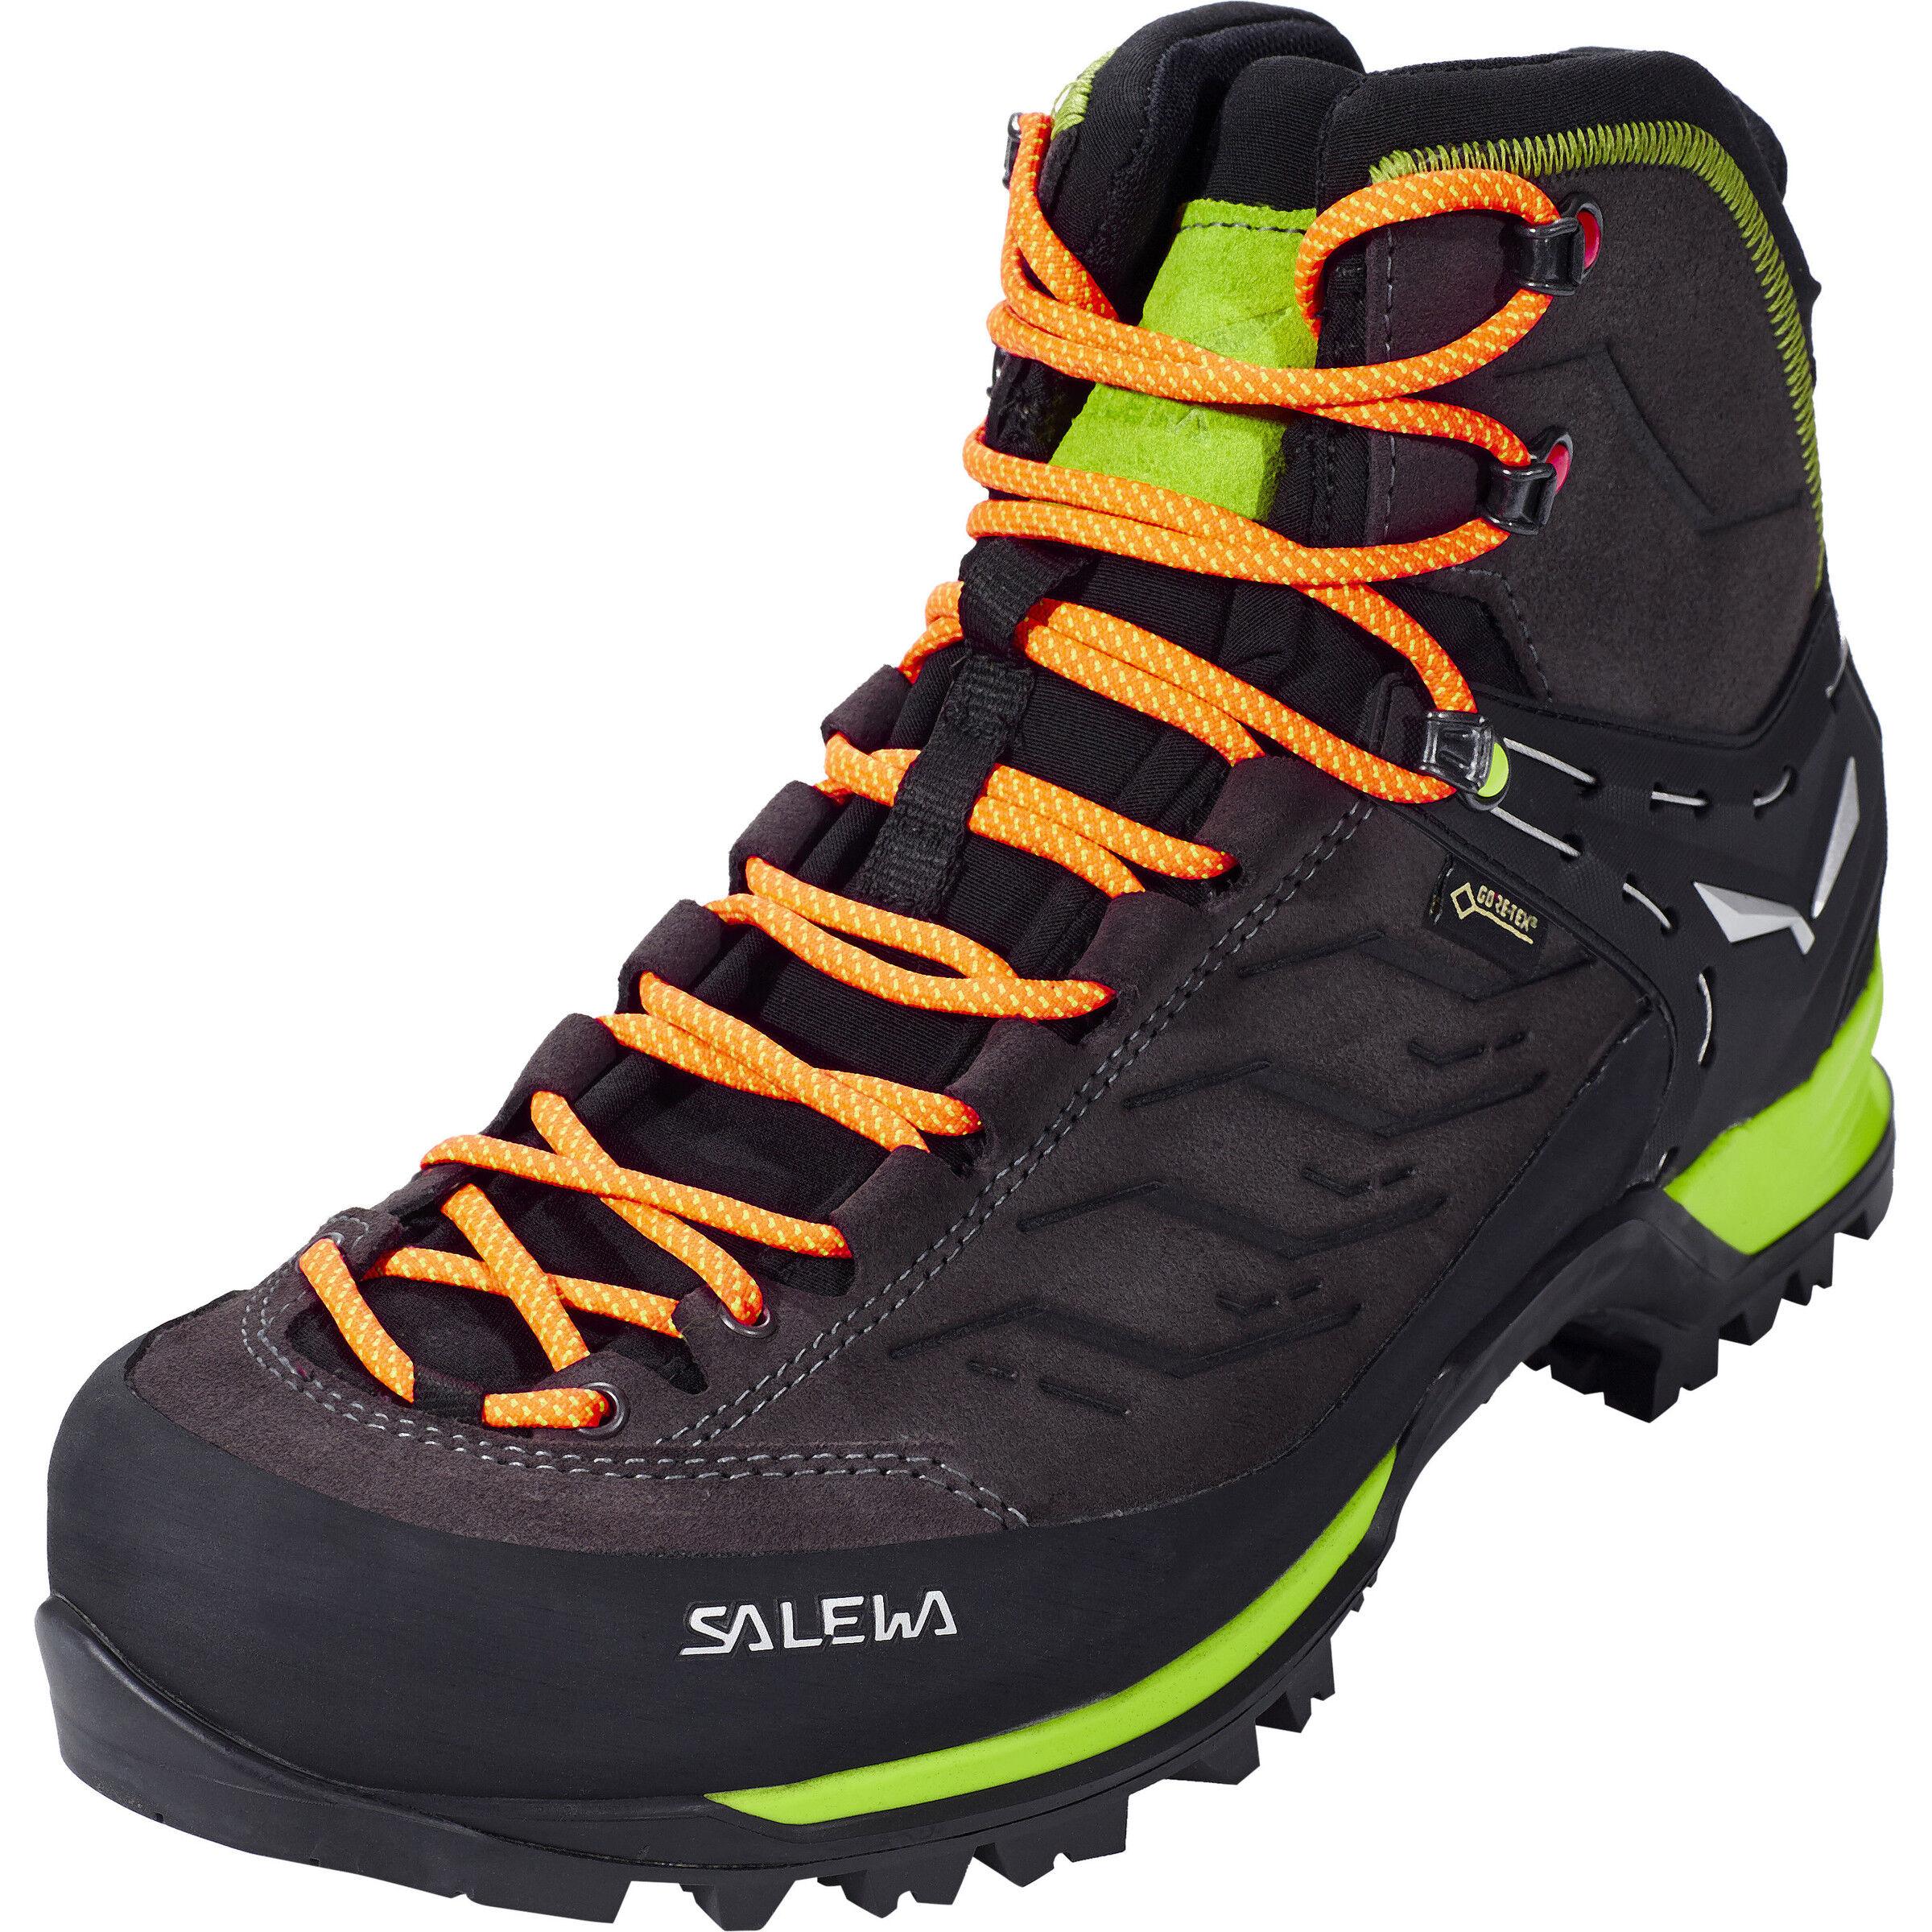 Herren MTN spring SALEWA Mid Trainer blacksulphur GTX Shoes QrshdBtCx